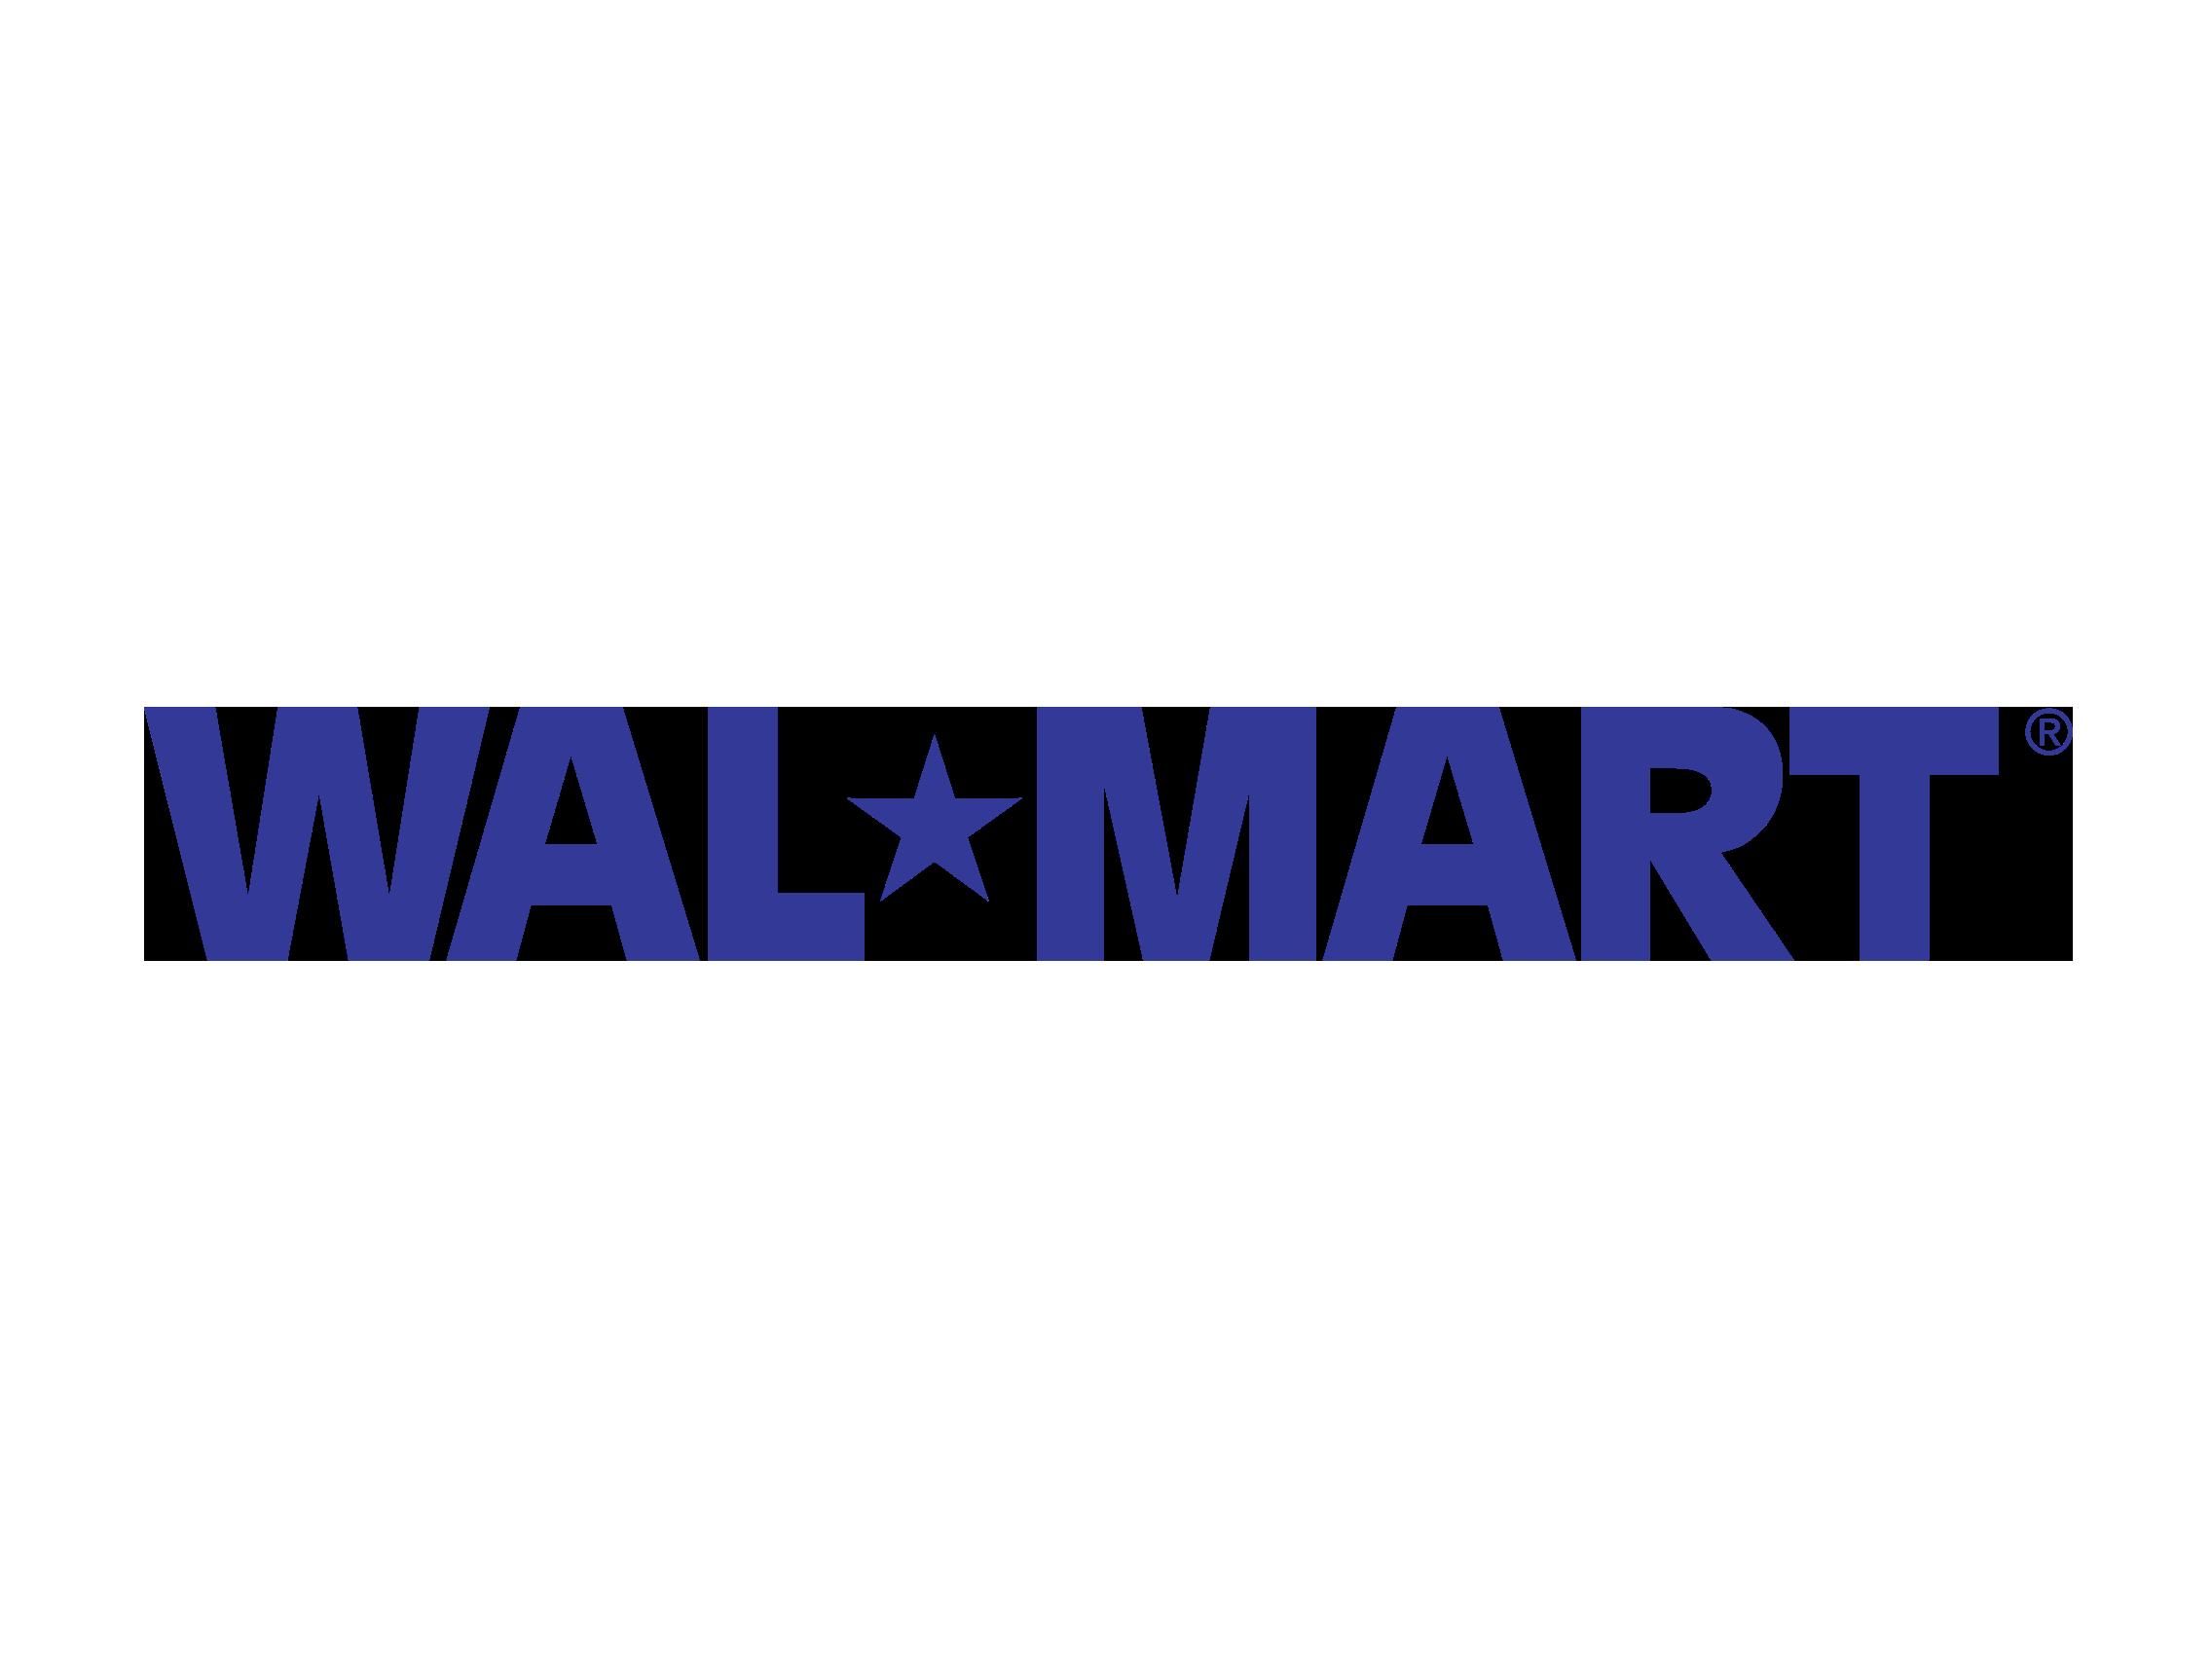 Wal-Mart Logo Wallpaper